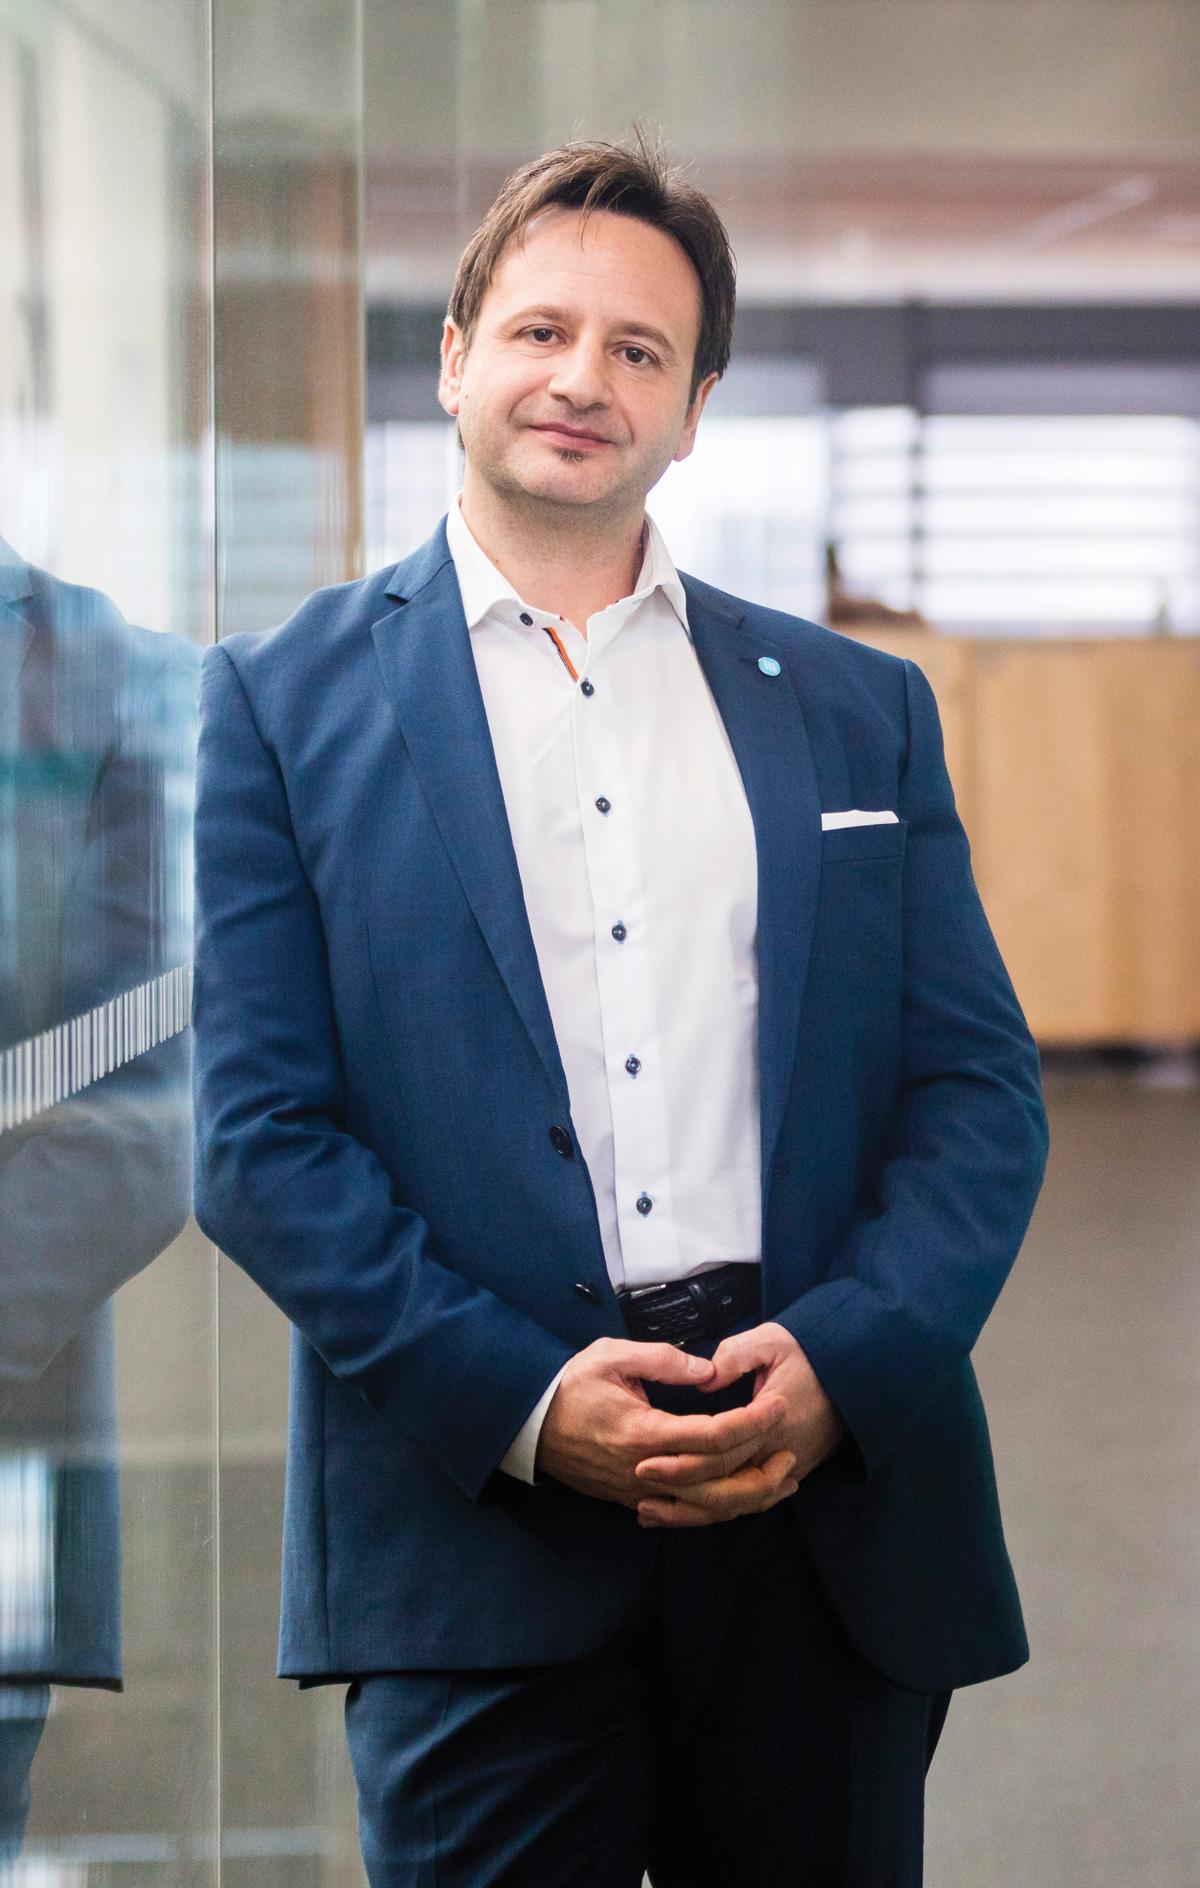 Emilio Romeo, CEO & Managing Director of Australia and New Zealand of Ericsson